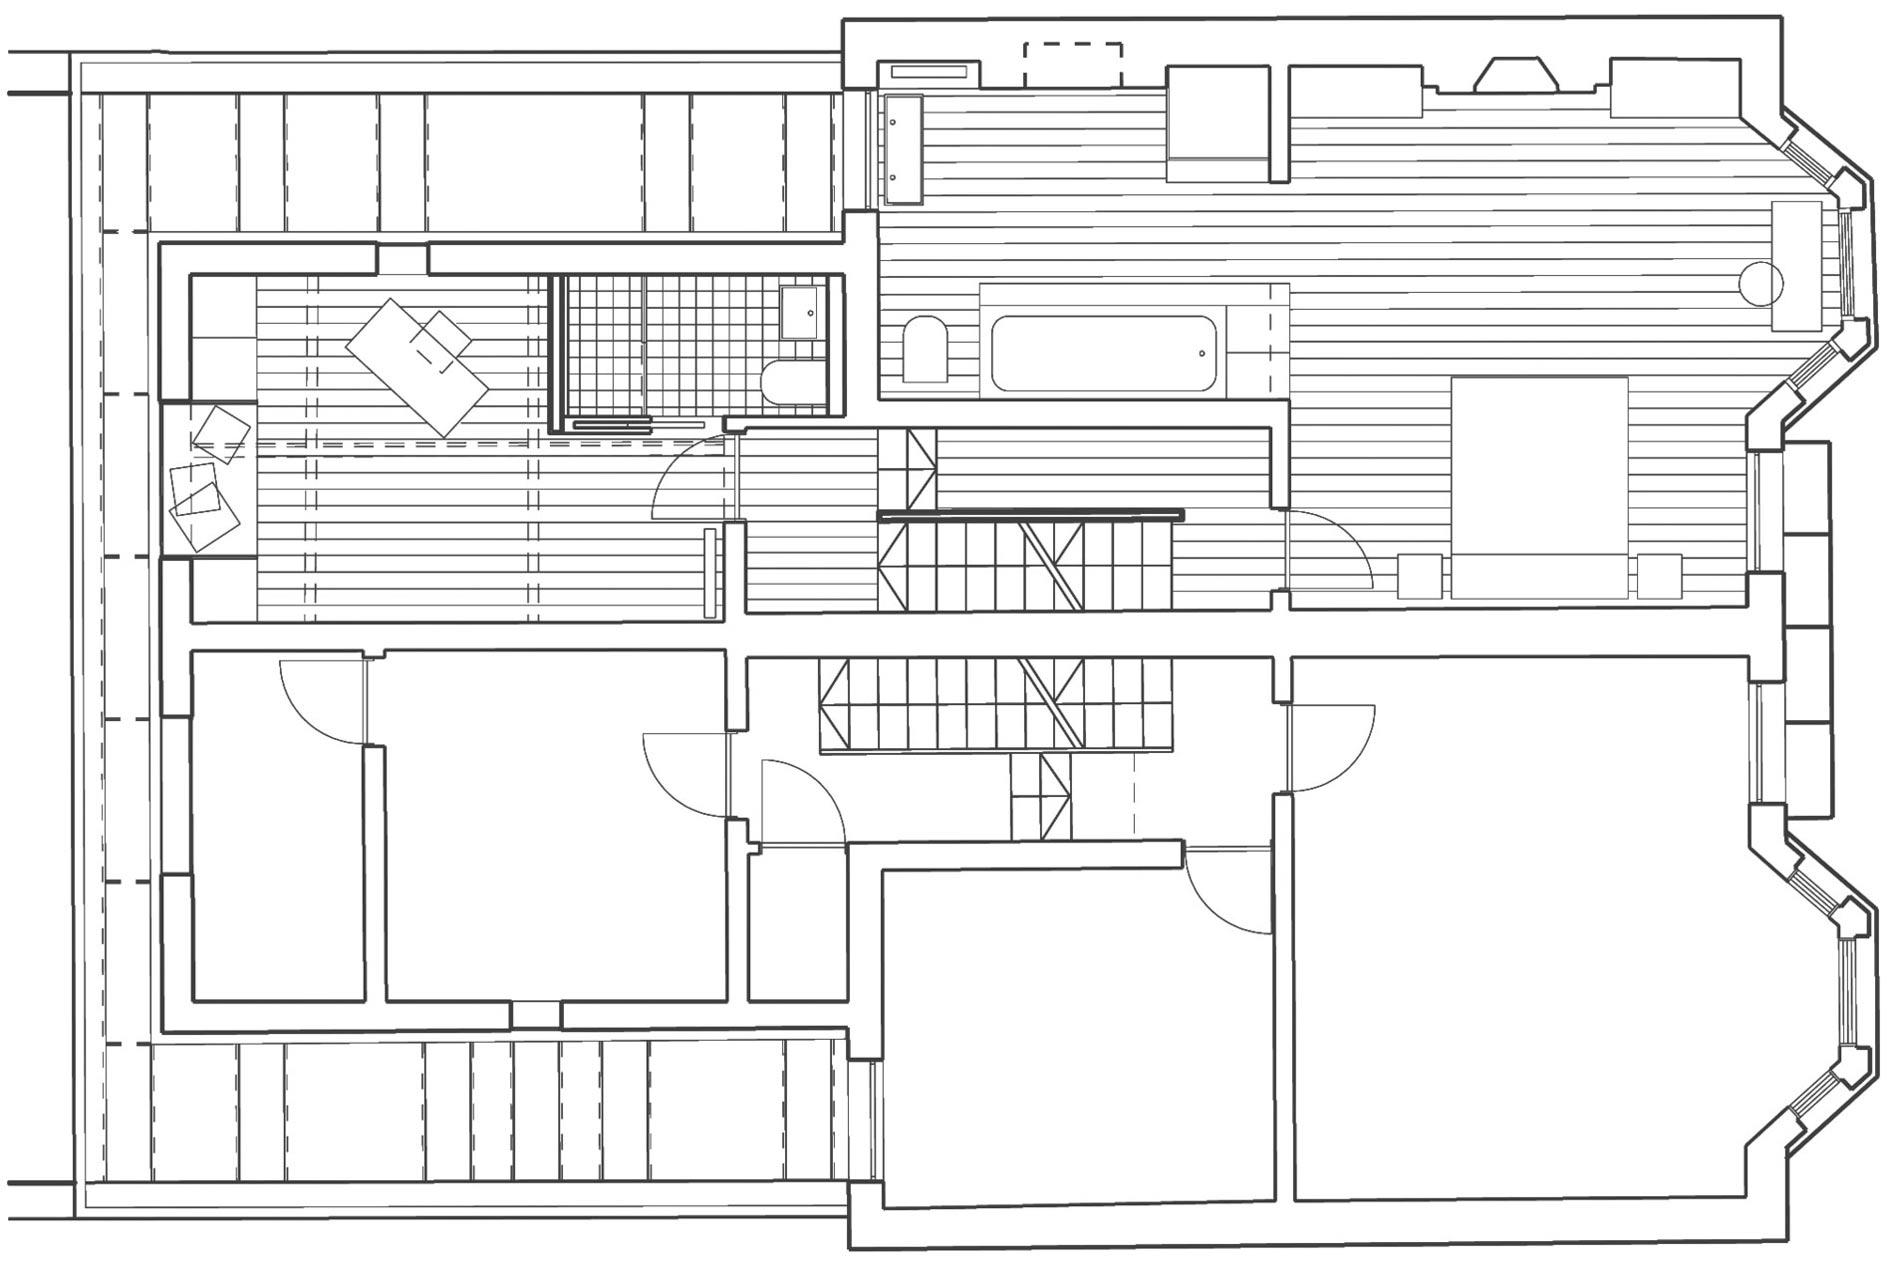 First Floor Plan, Modern Home in London by Bureau de Change Design Office